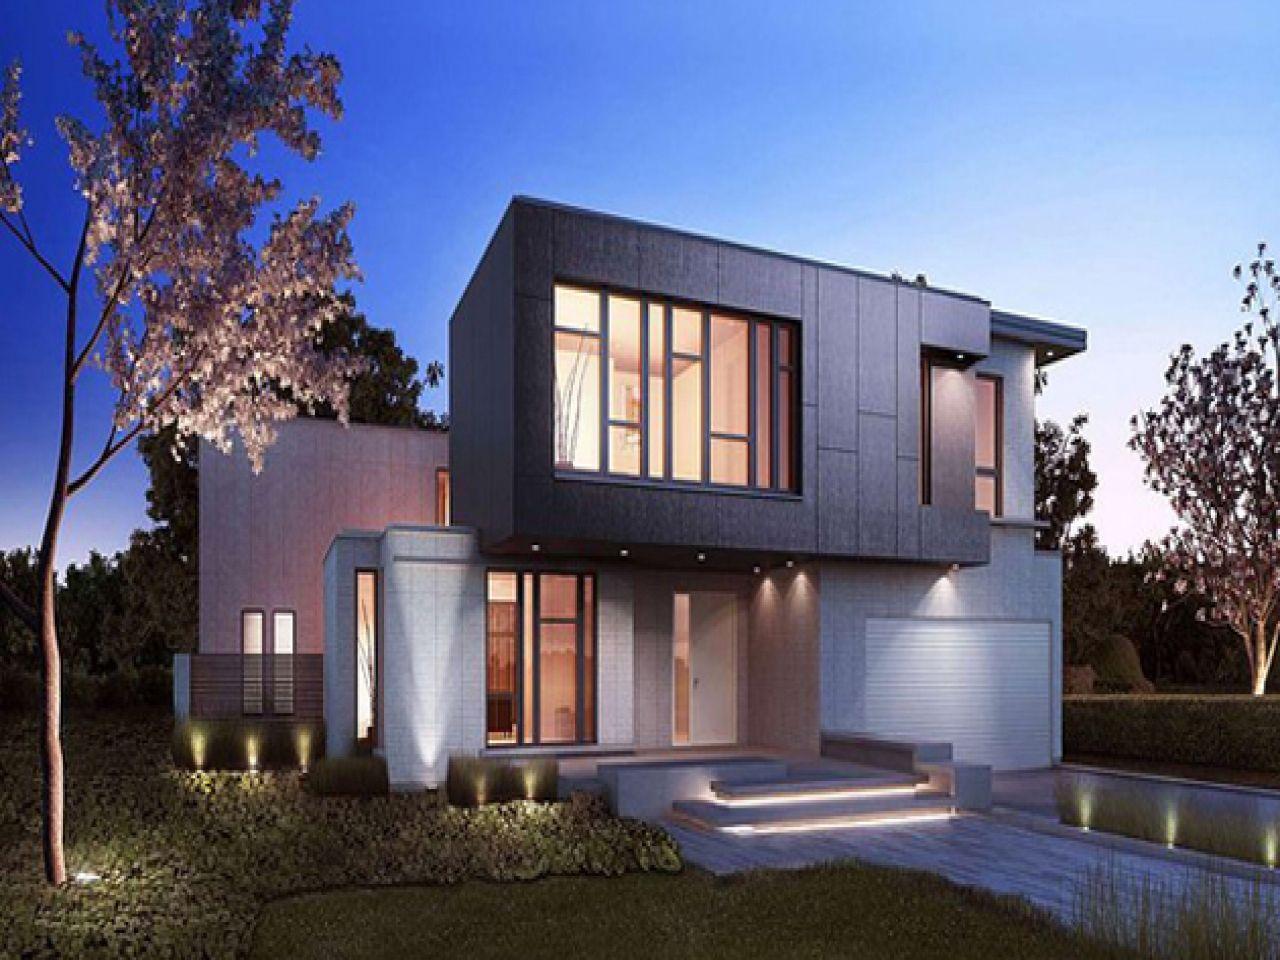 modern house design 2016 philippines hiqra pinterest modern